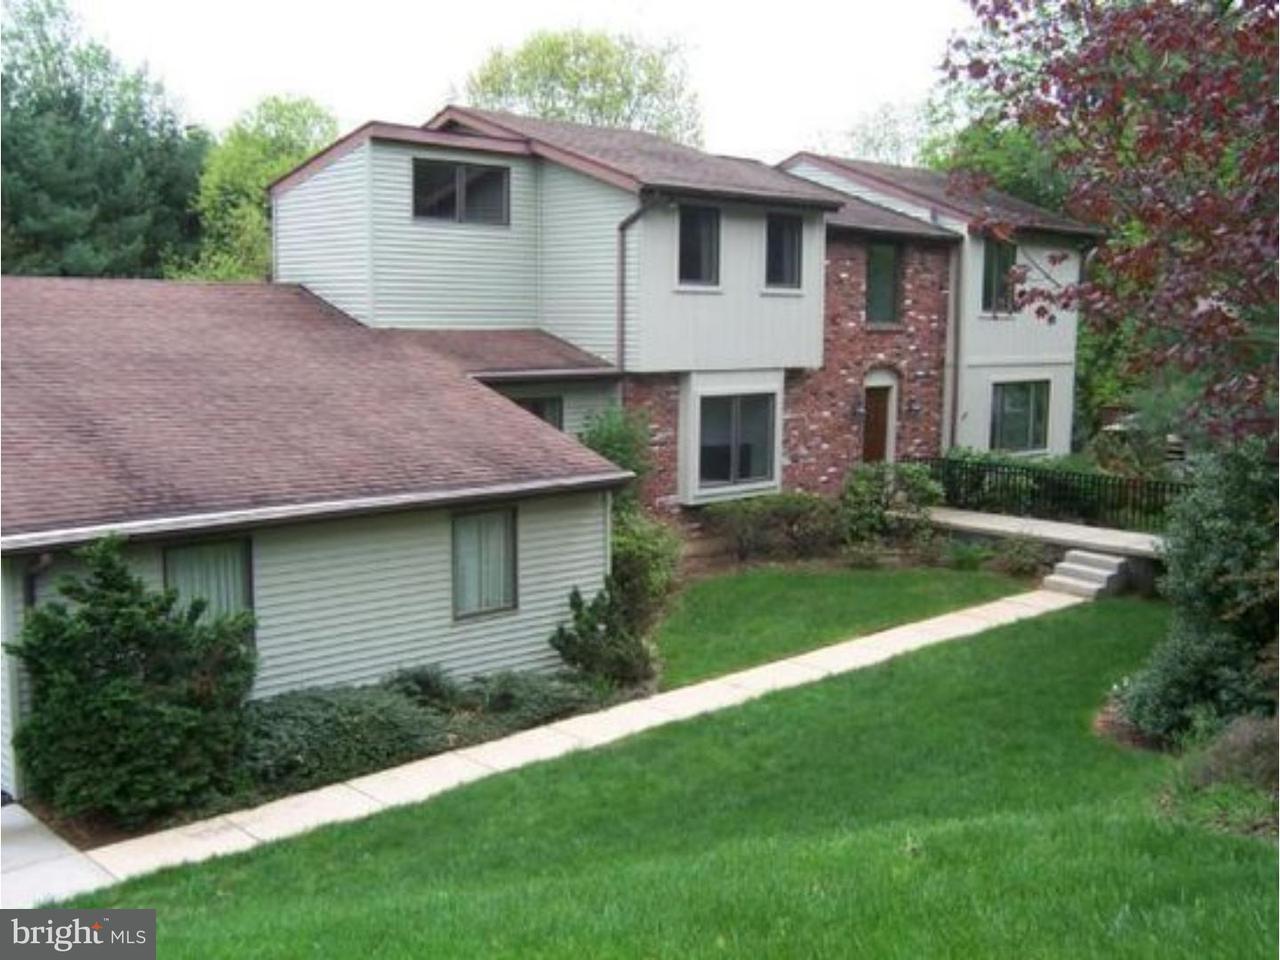 Single Family Home for Rent at 690 TWIN BRIDGE Drive Wayne, Pennsylvania 19087 United States